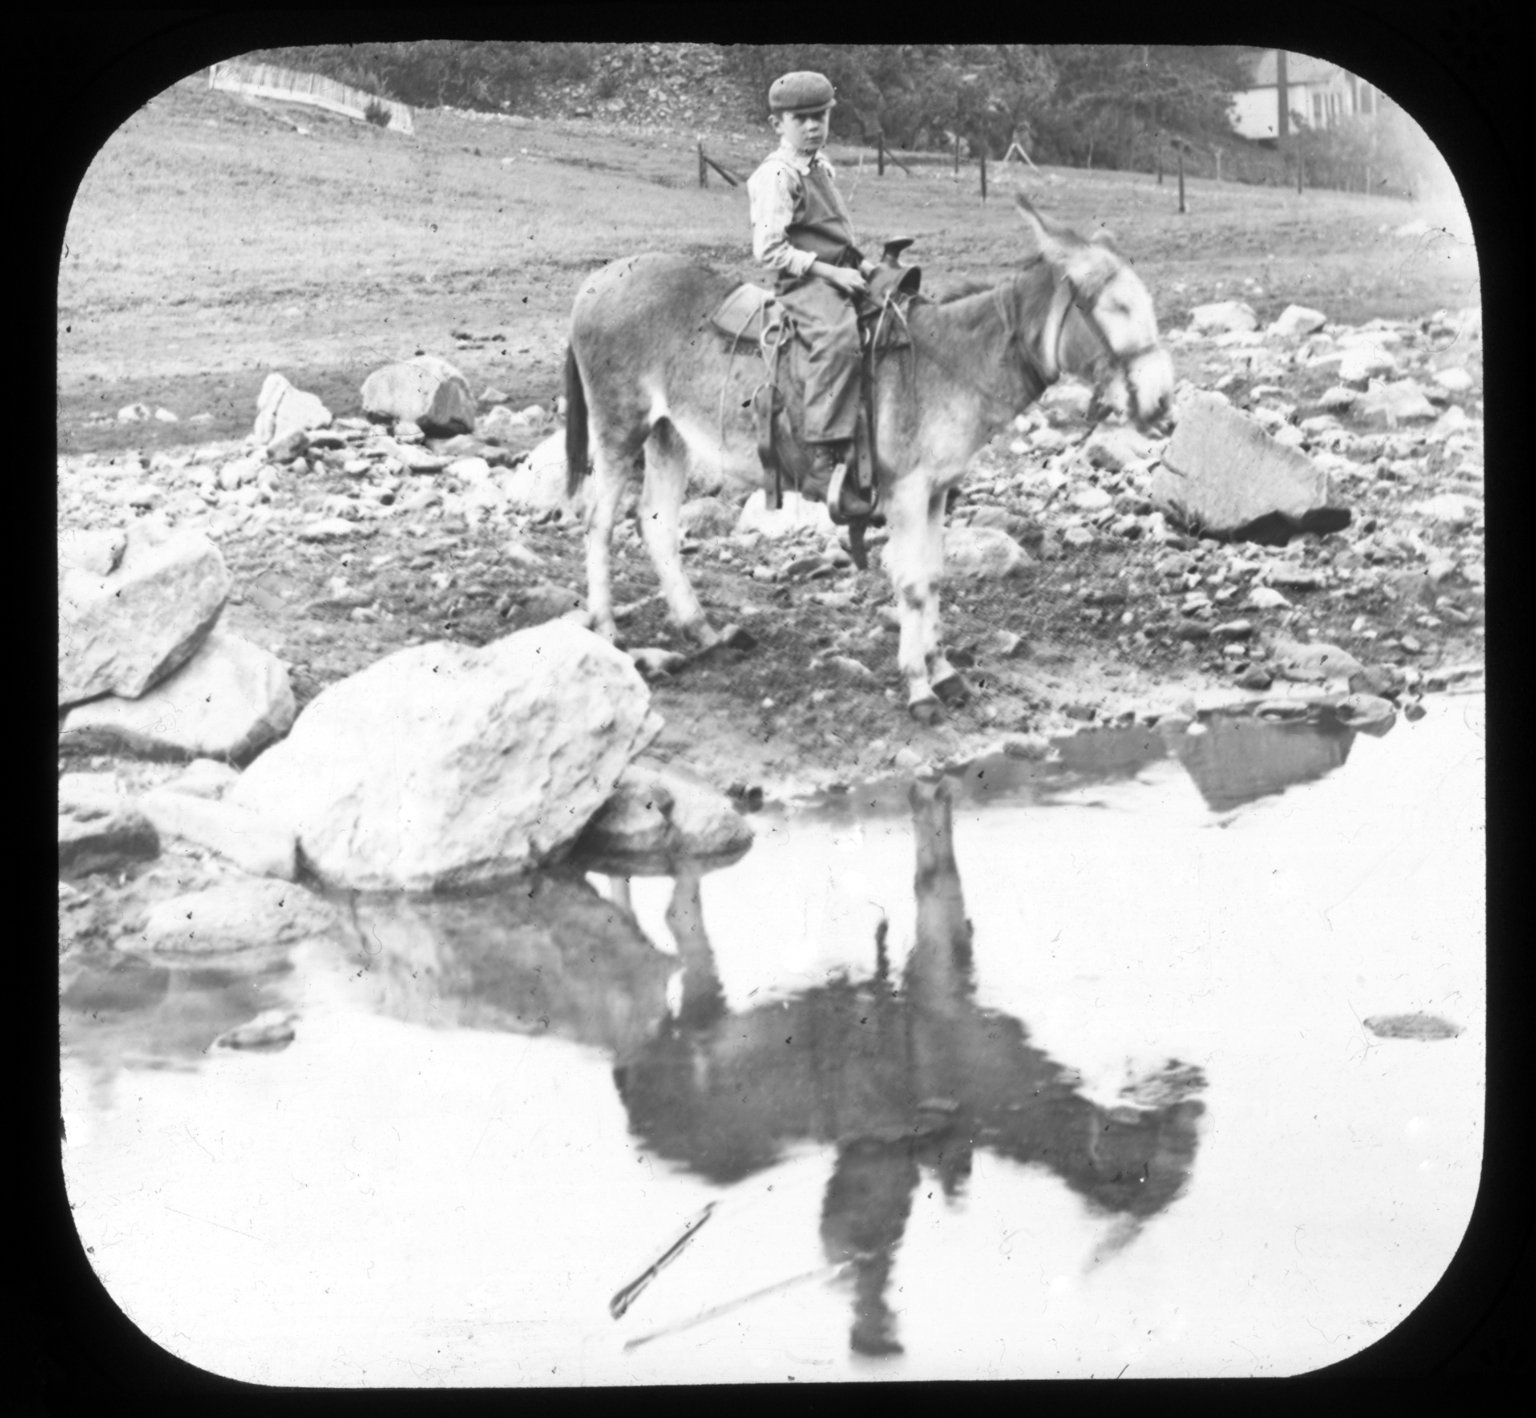 Young boy on donkey